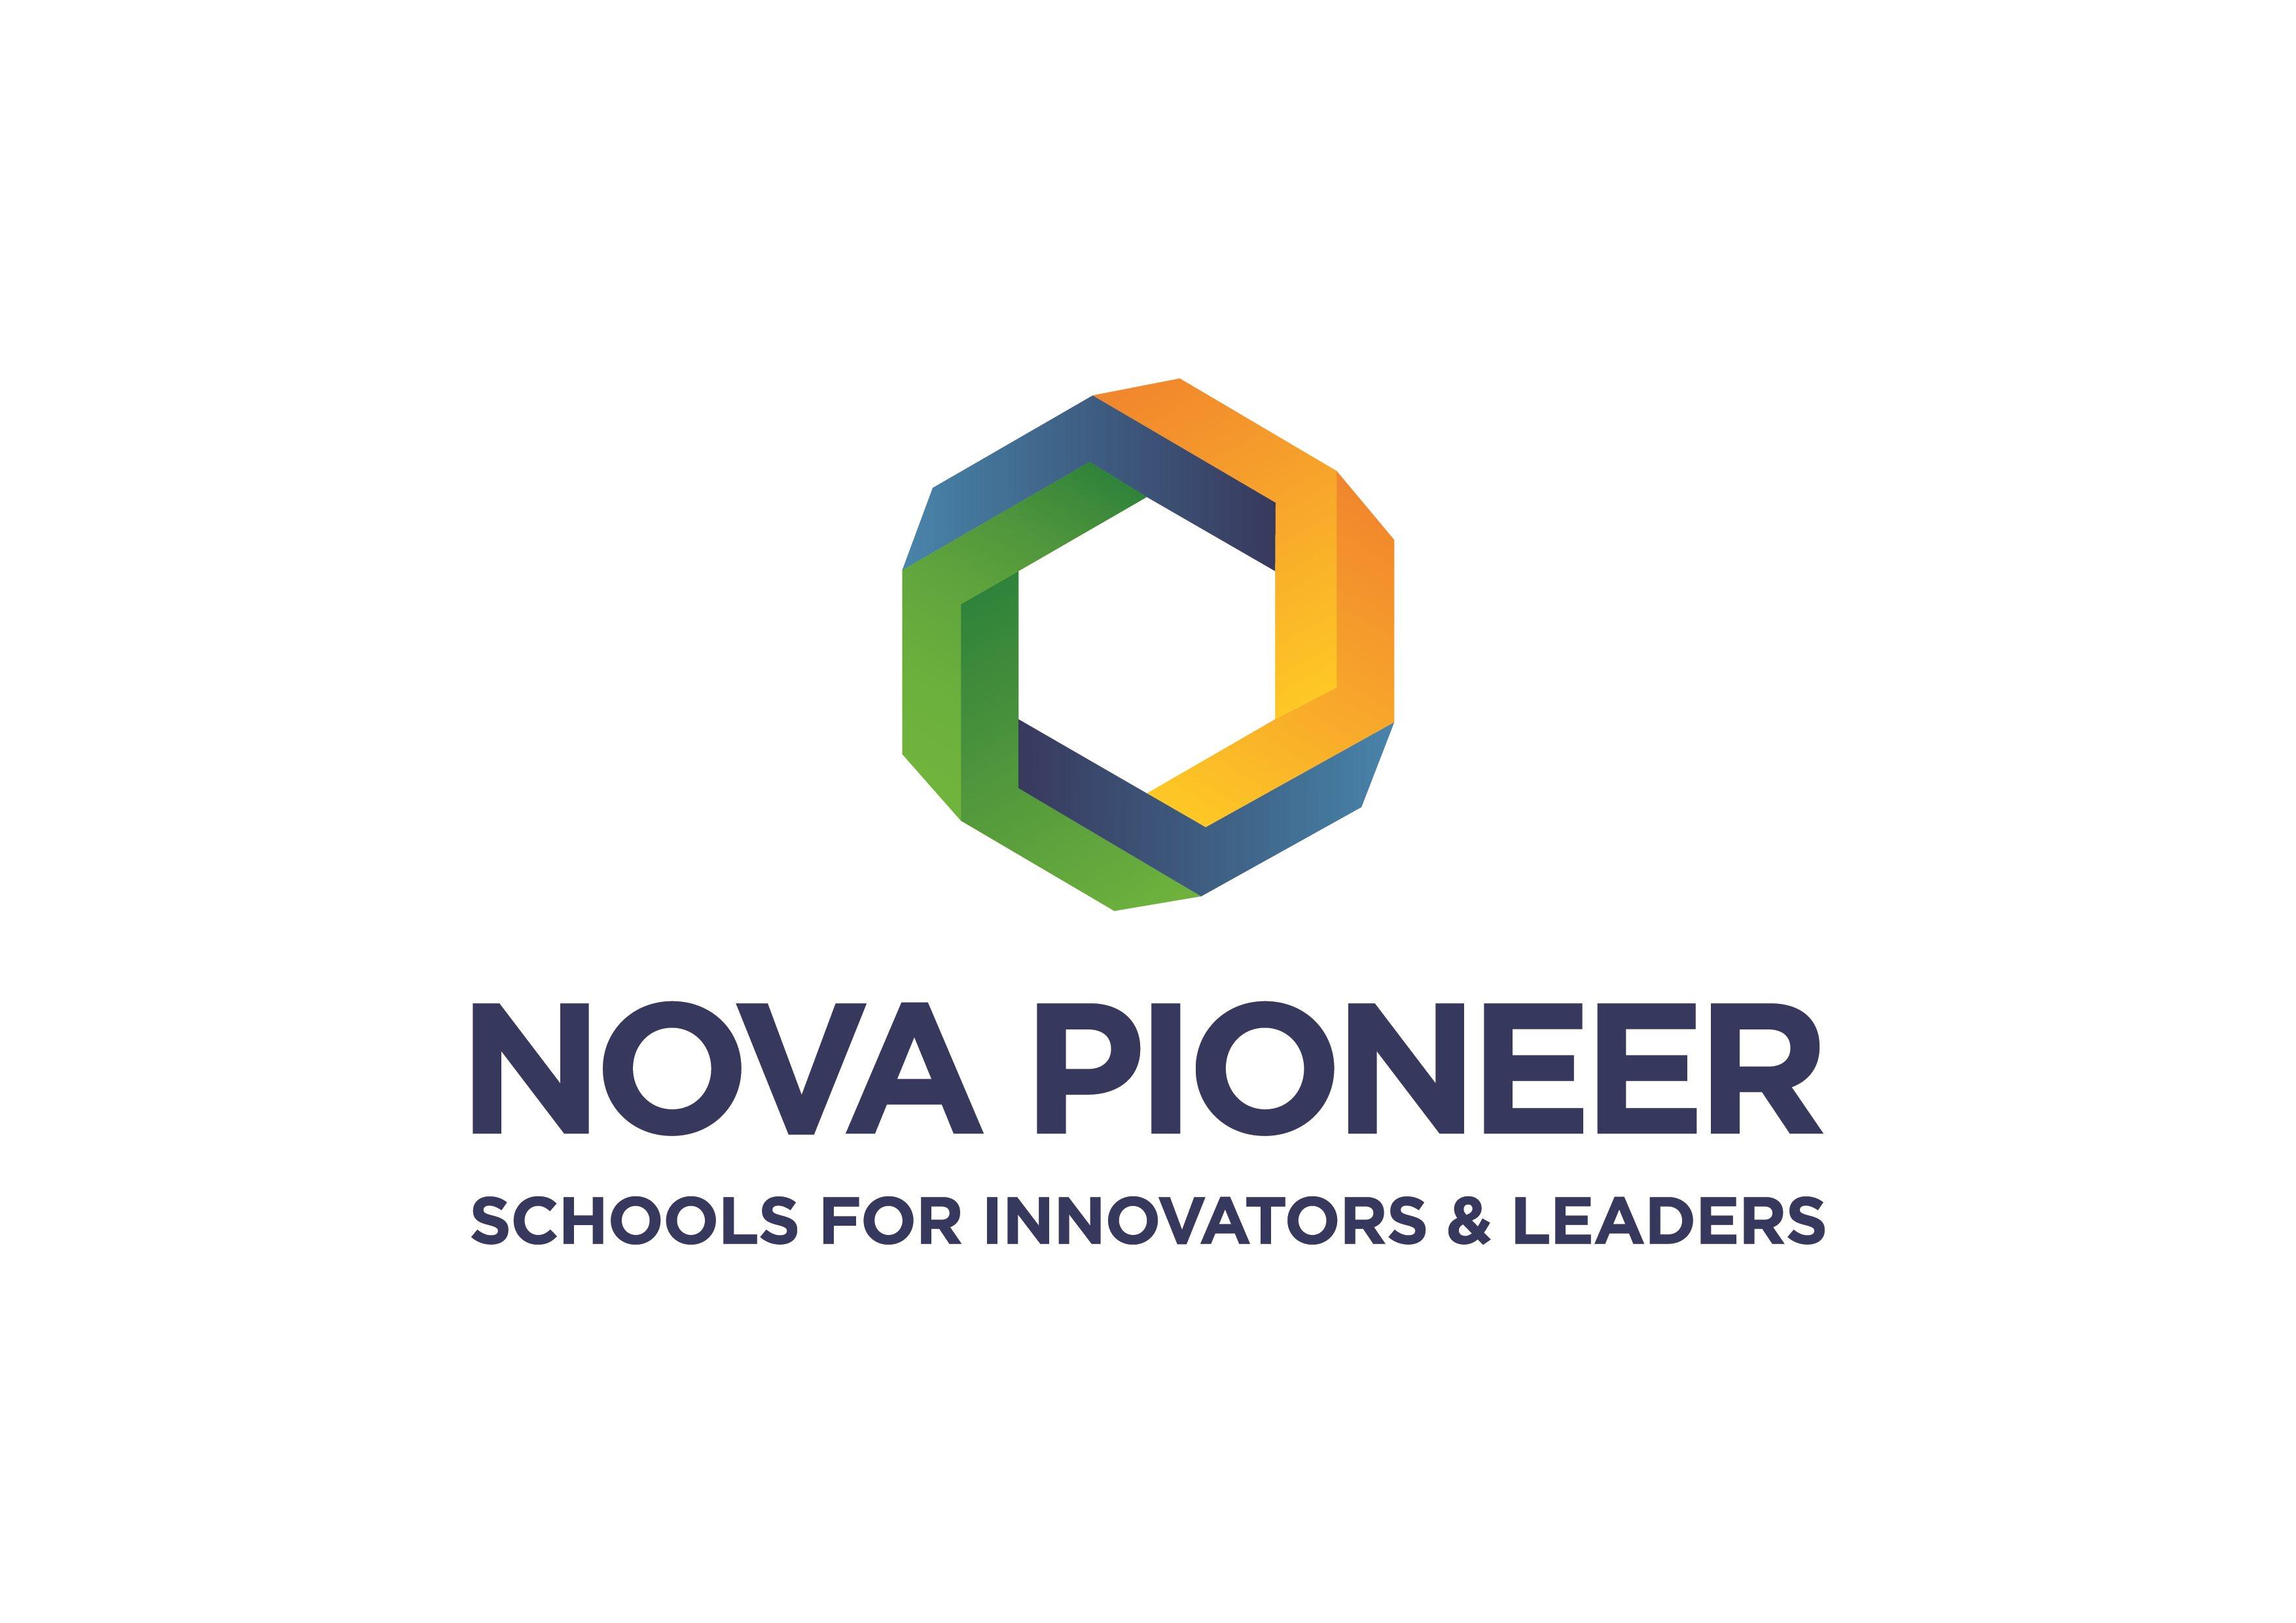 Nova Pioneer